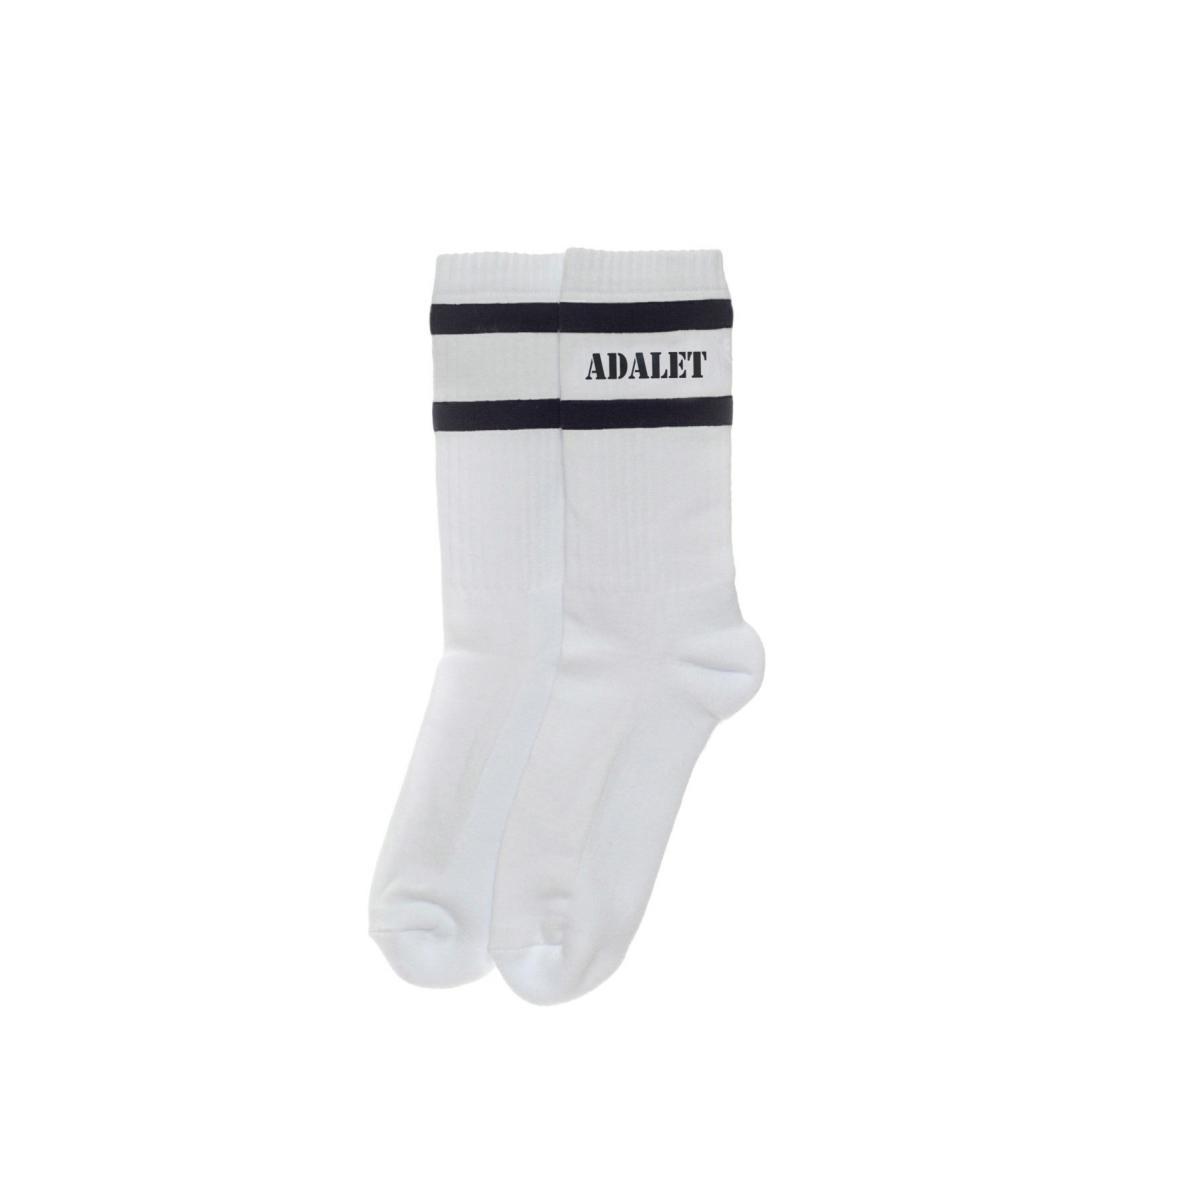 Calzini Streetwear Socks ADALET black unisex rif. AC02